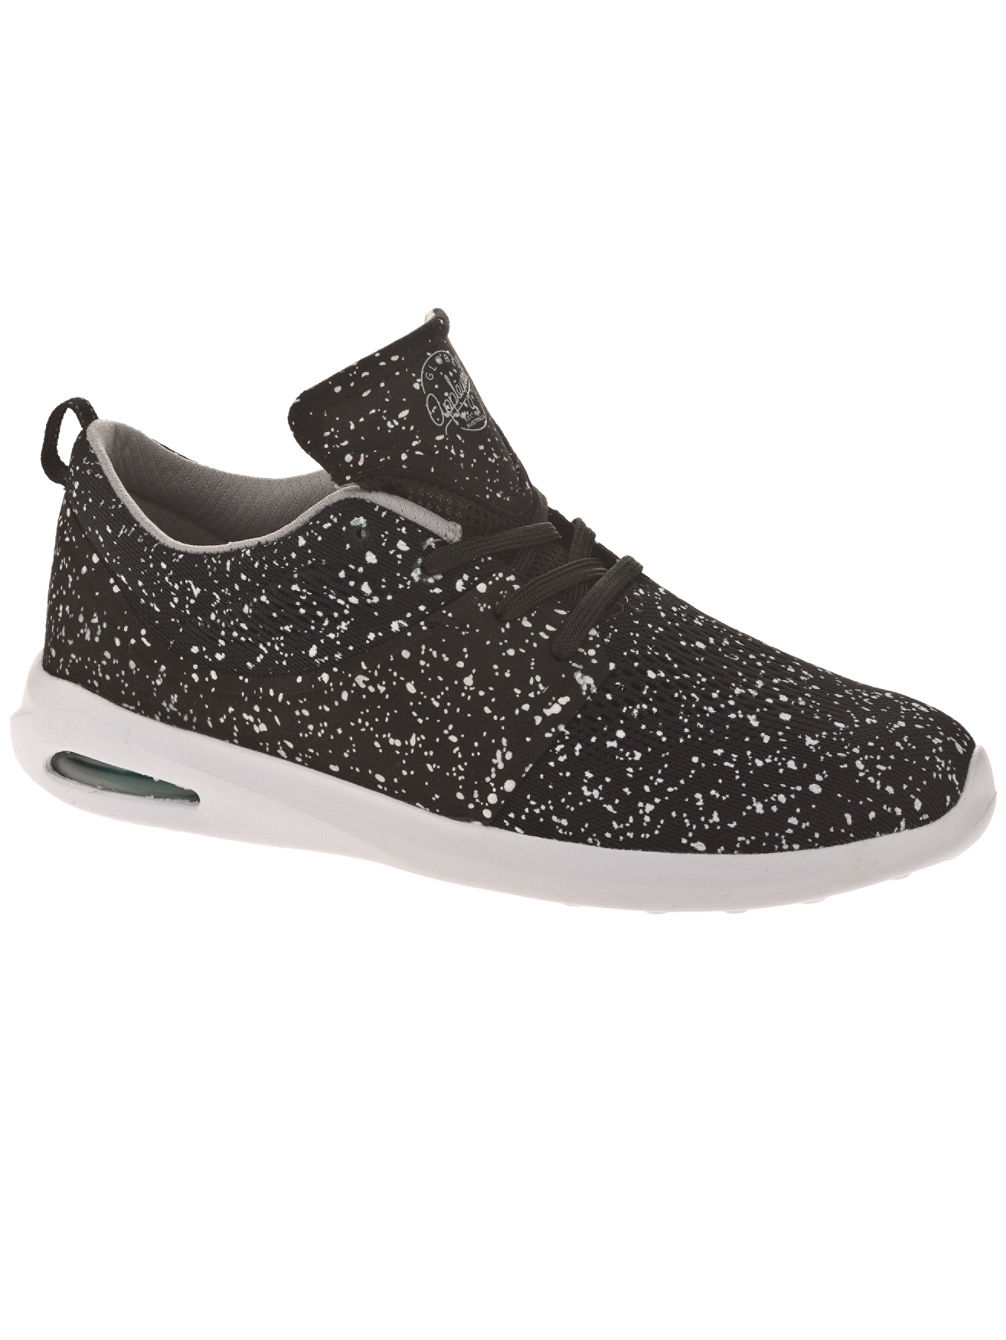 globe-mahalo-lyte-sneakers